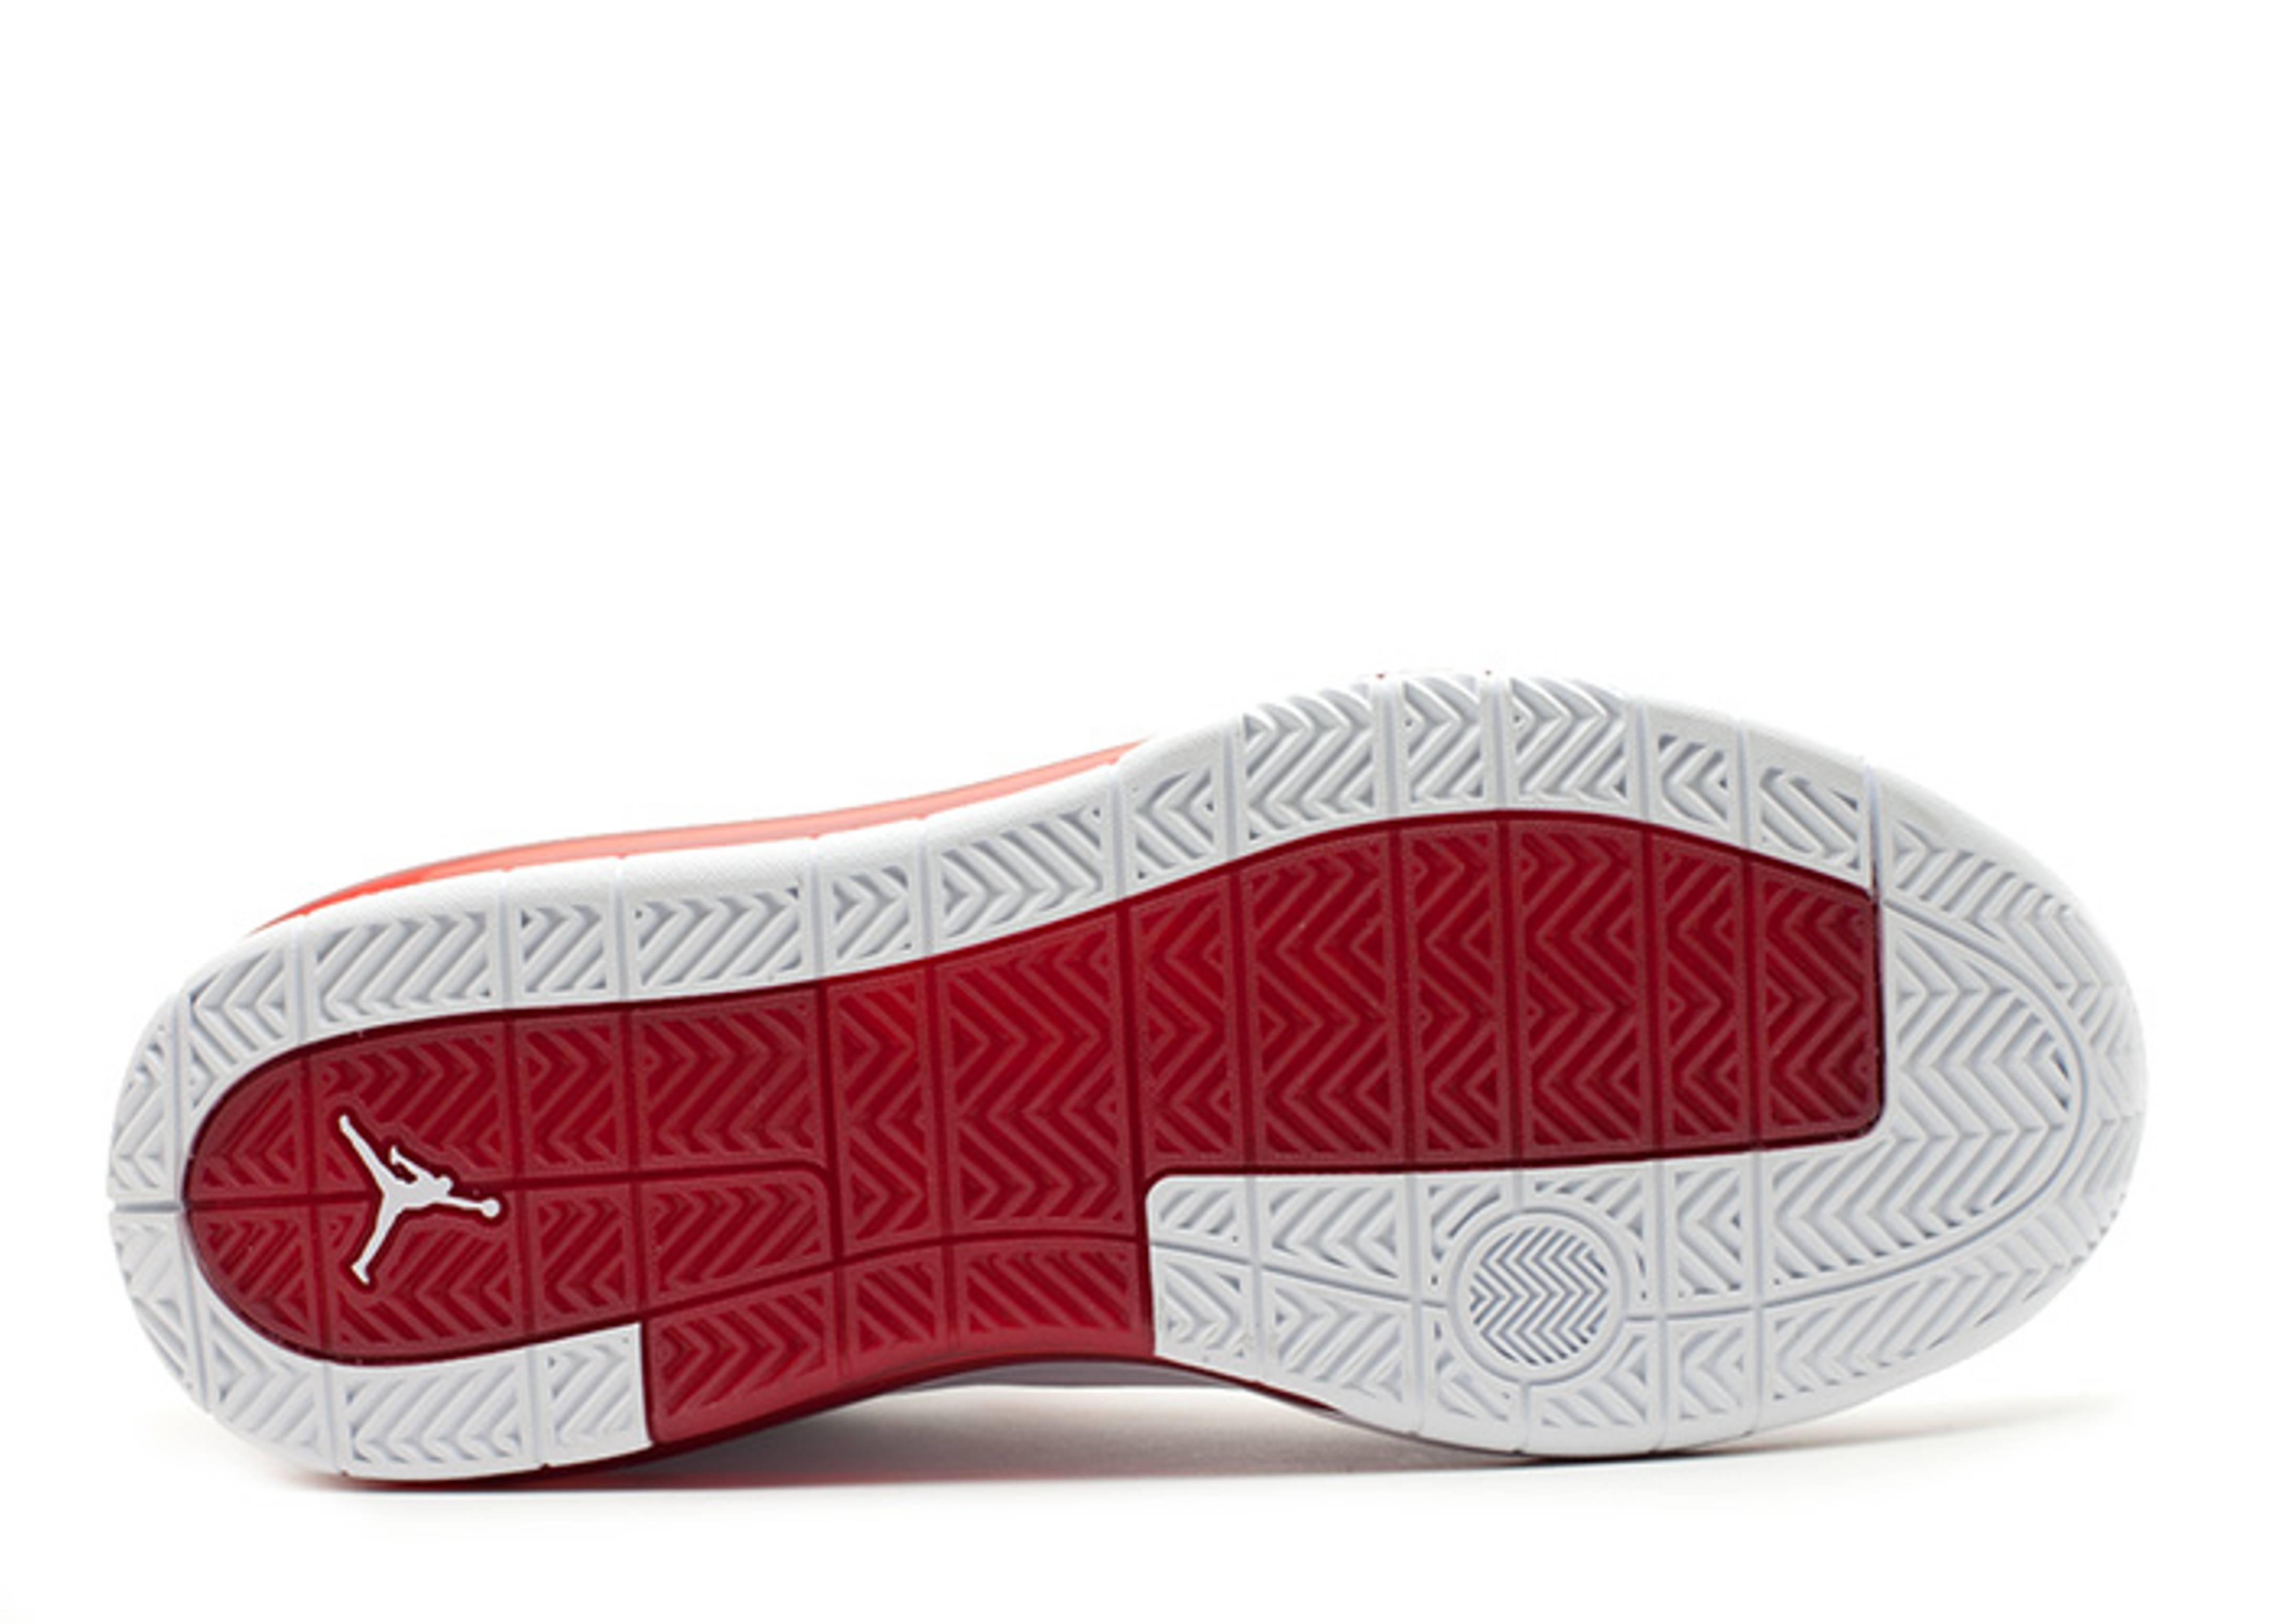 b69a49ab8b8 Air Jordan 2.0